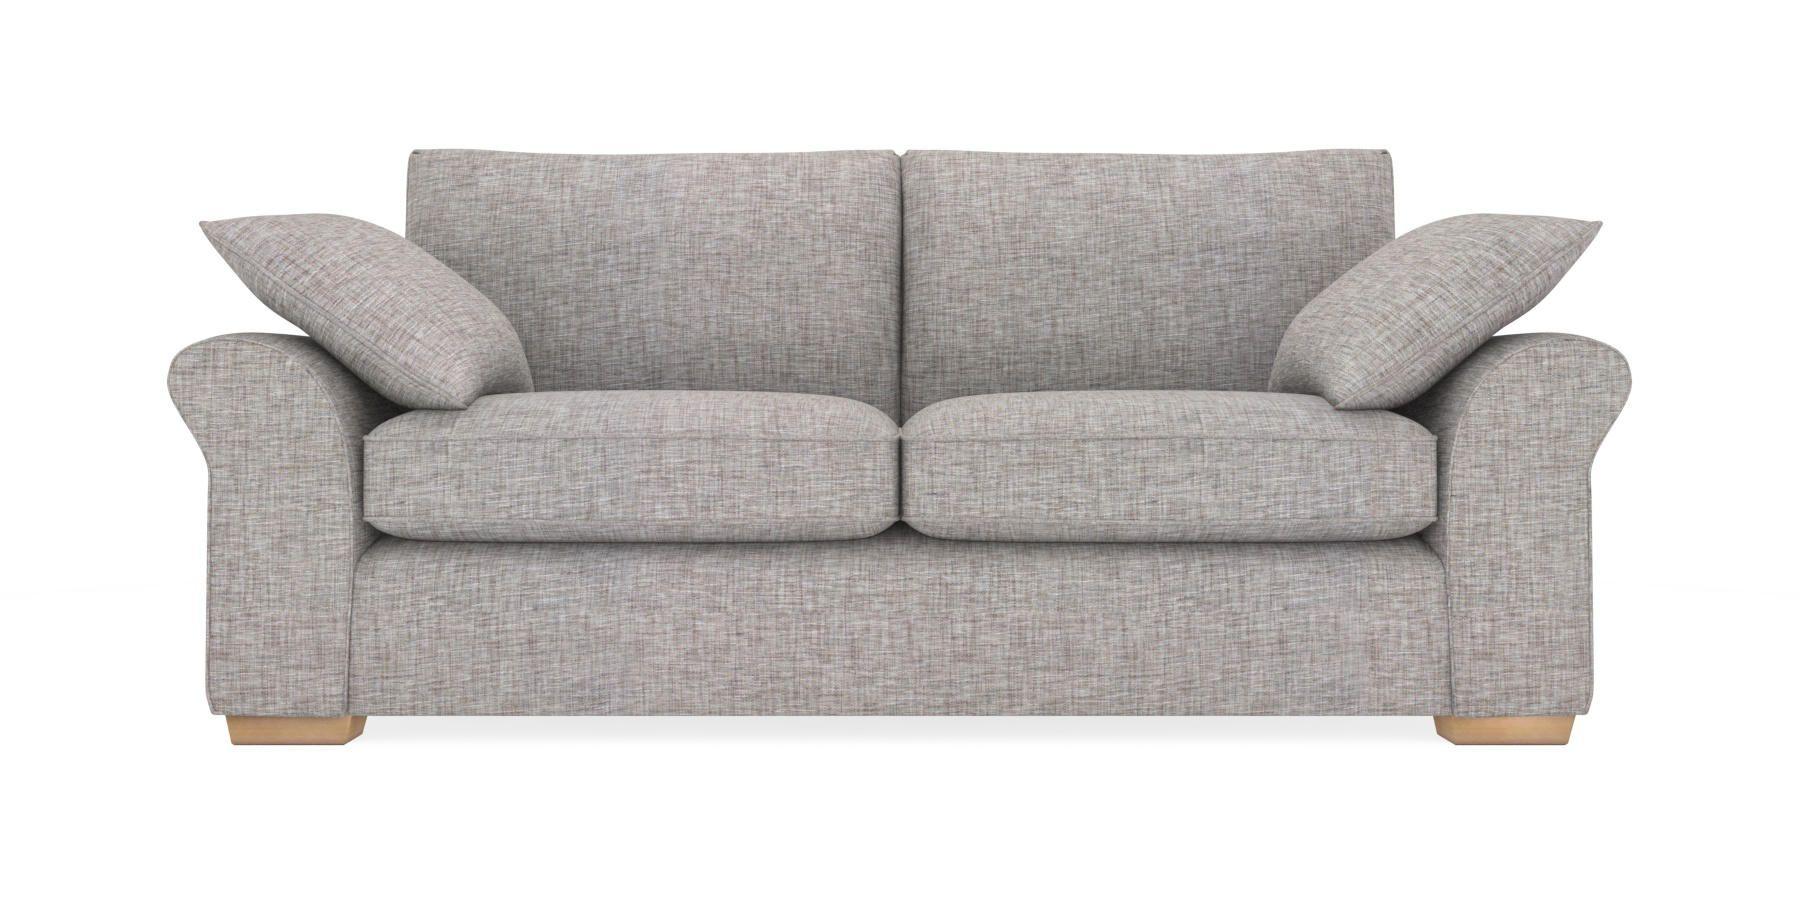 buy garda large sofa 3 seats boucle blend light dove block light from the next uk online shop. Black Bedroom Furniture Sets. Home Design Ideas